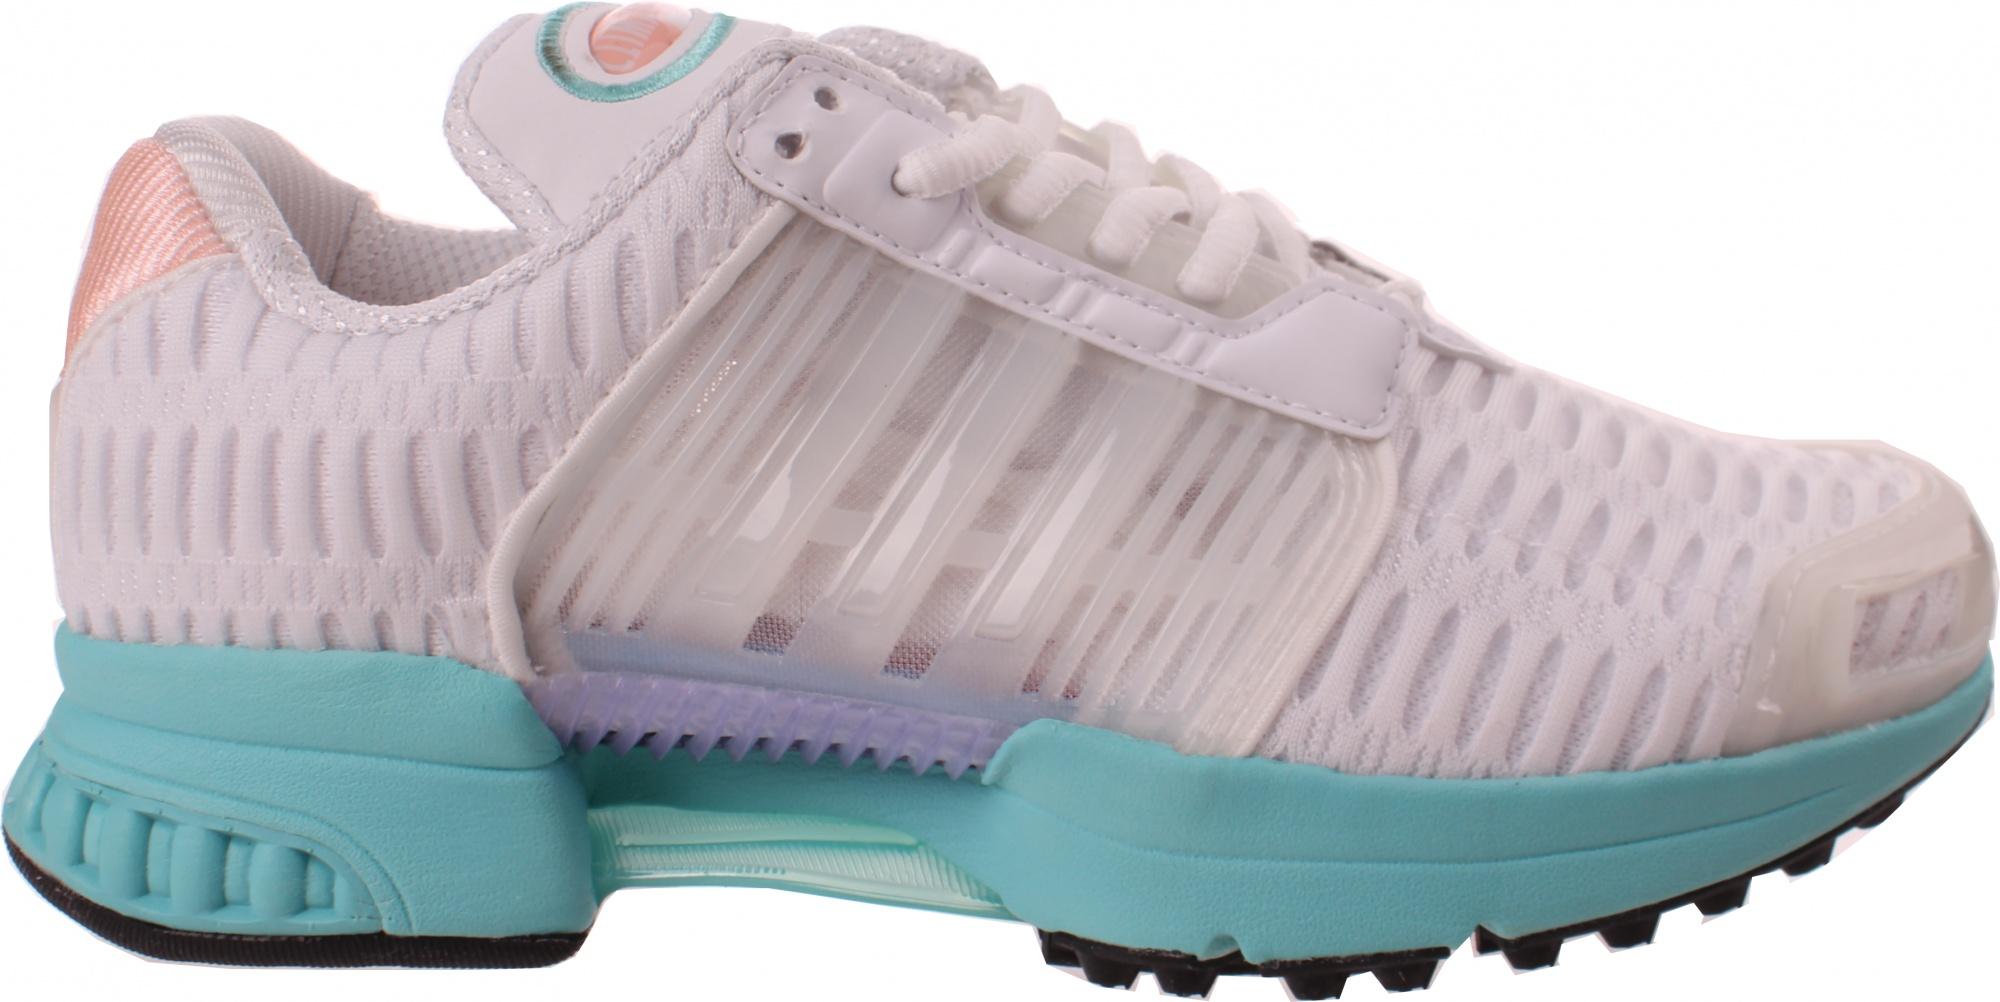 brand new 5a539 76b05 Opruiming adidas sneakers Climacool dames witgroen. Vergroten